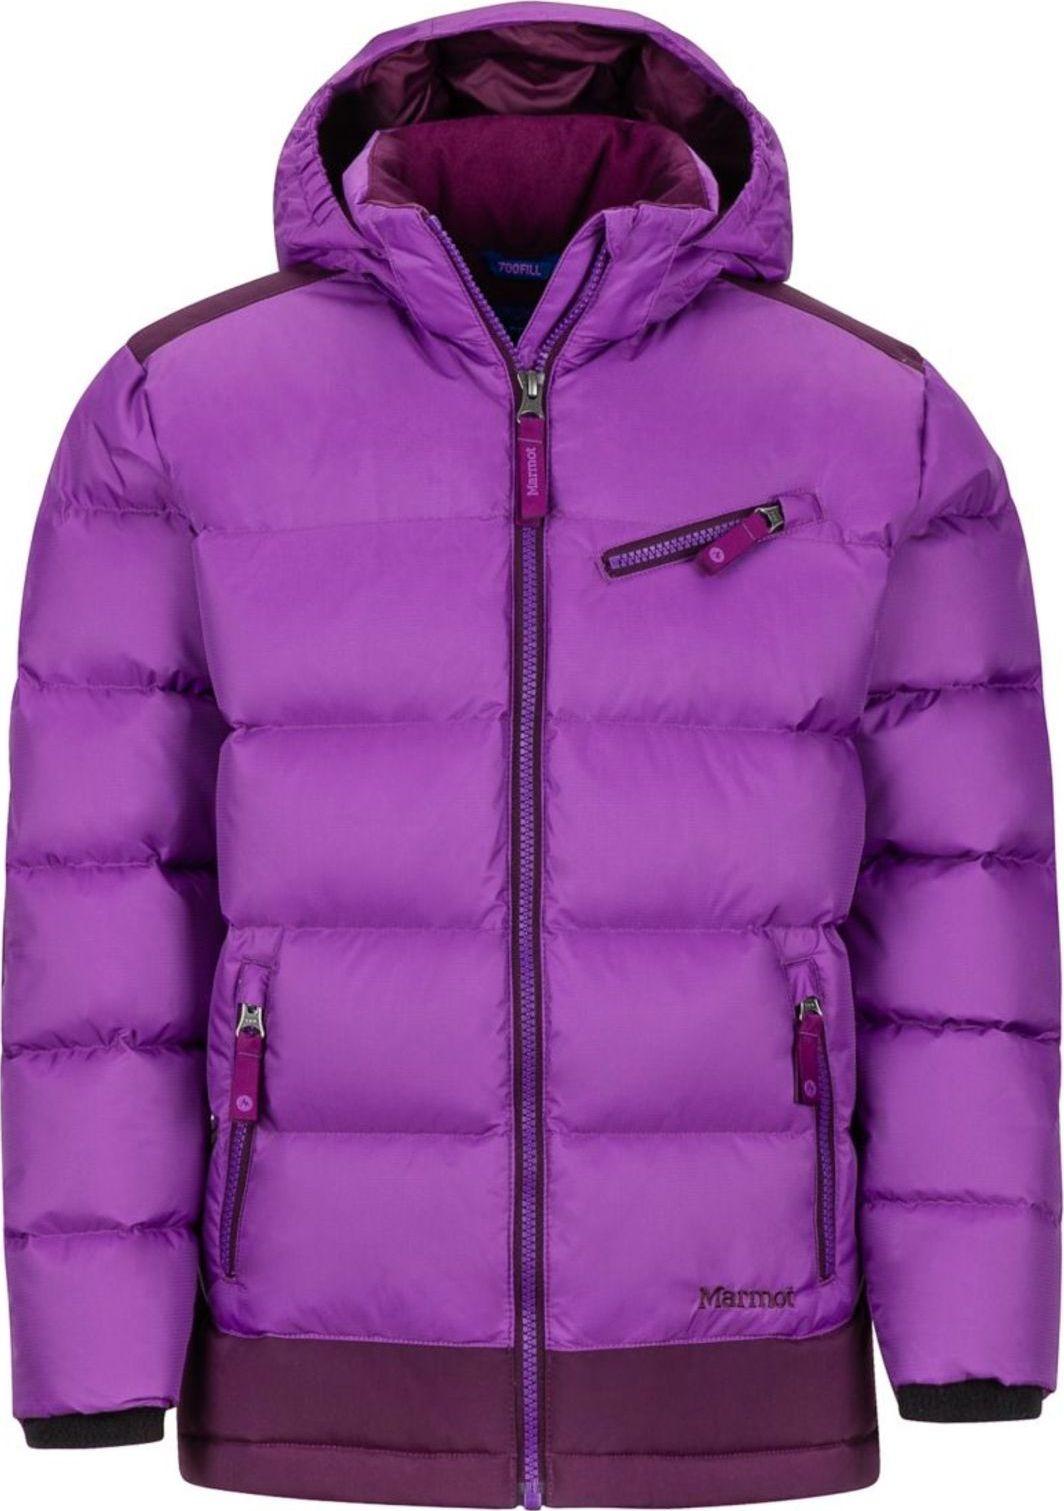 Marmot Girl's Sling Shot Jacket Bright Violet/Dark Purple XL